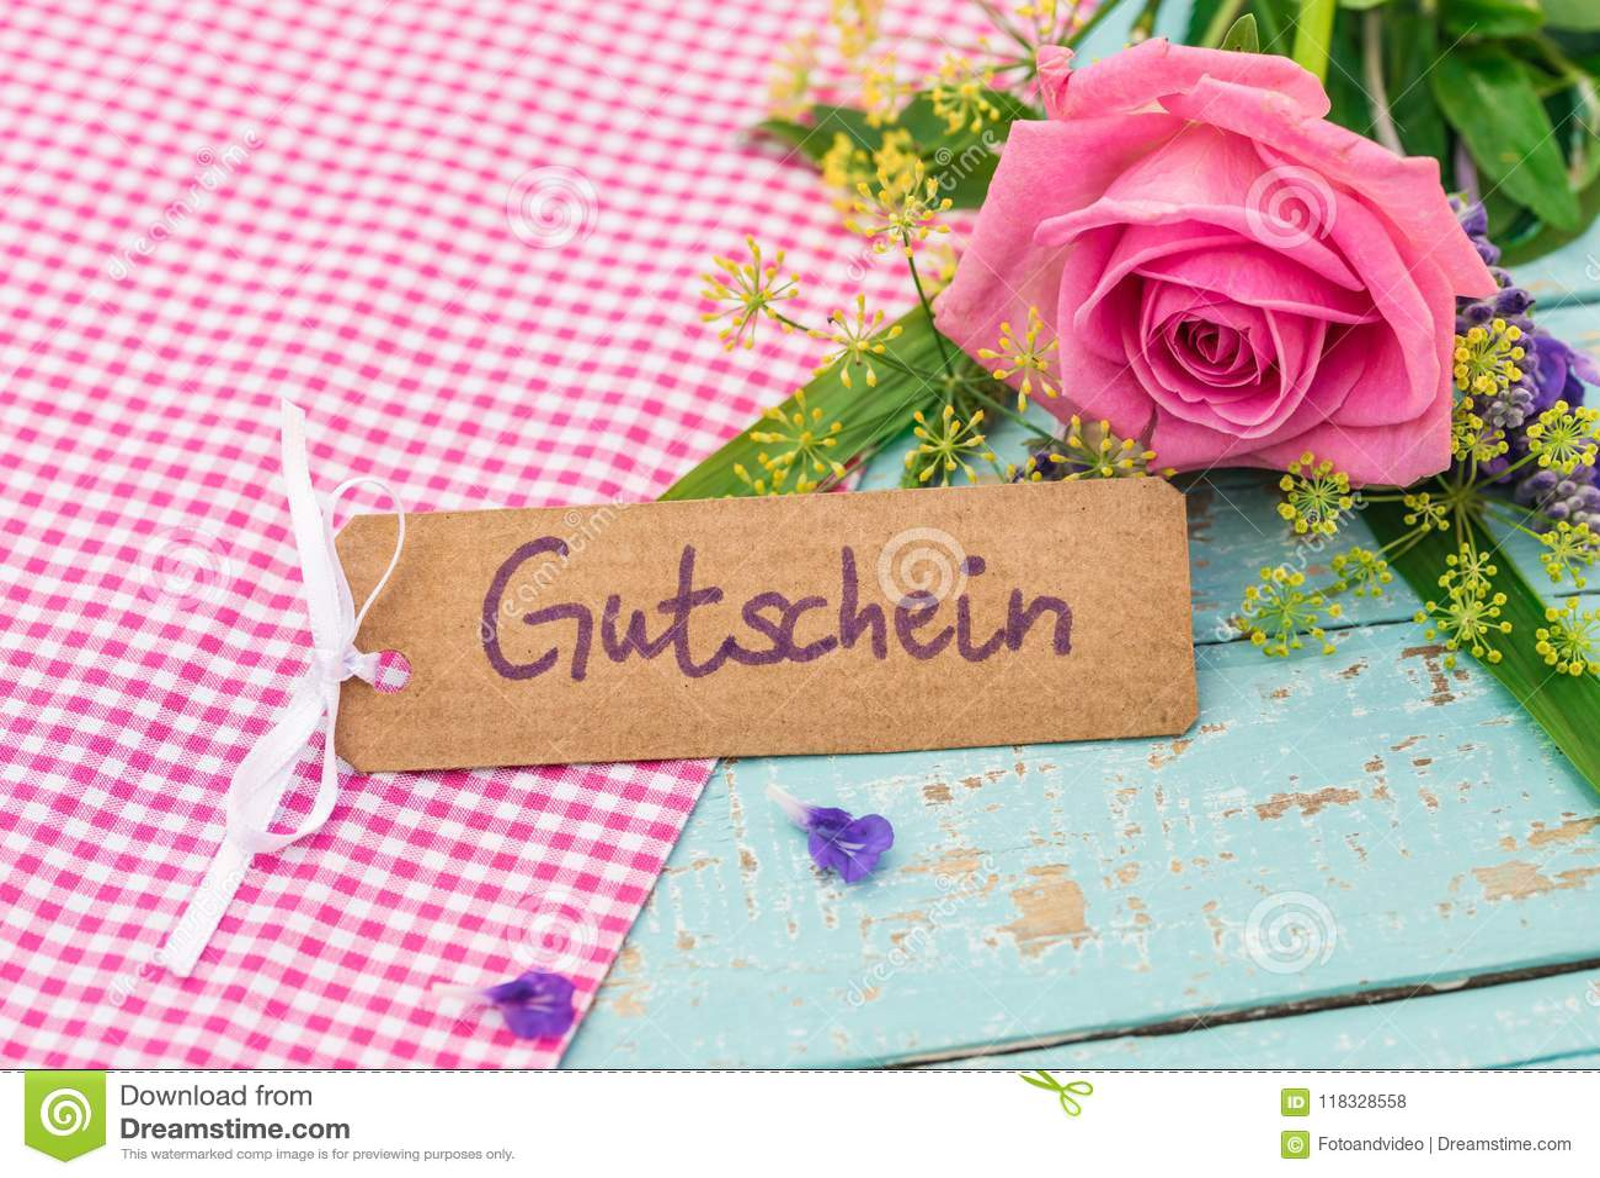 Giftkaart met Duitse woord, Gutschein, middelenbon of coupon met mooie bos van floers